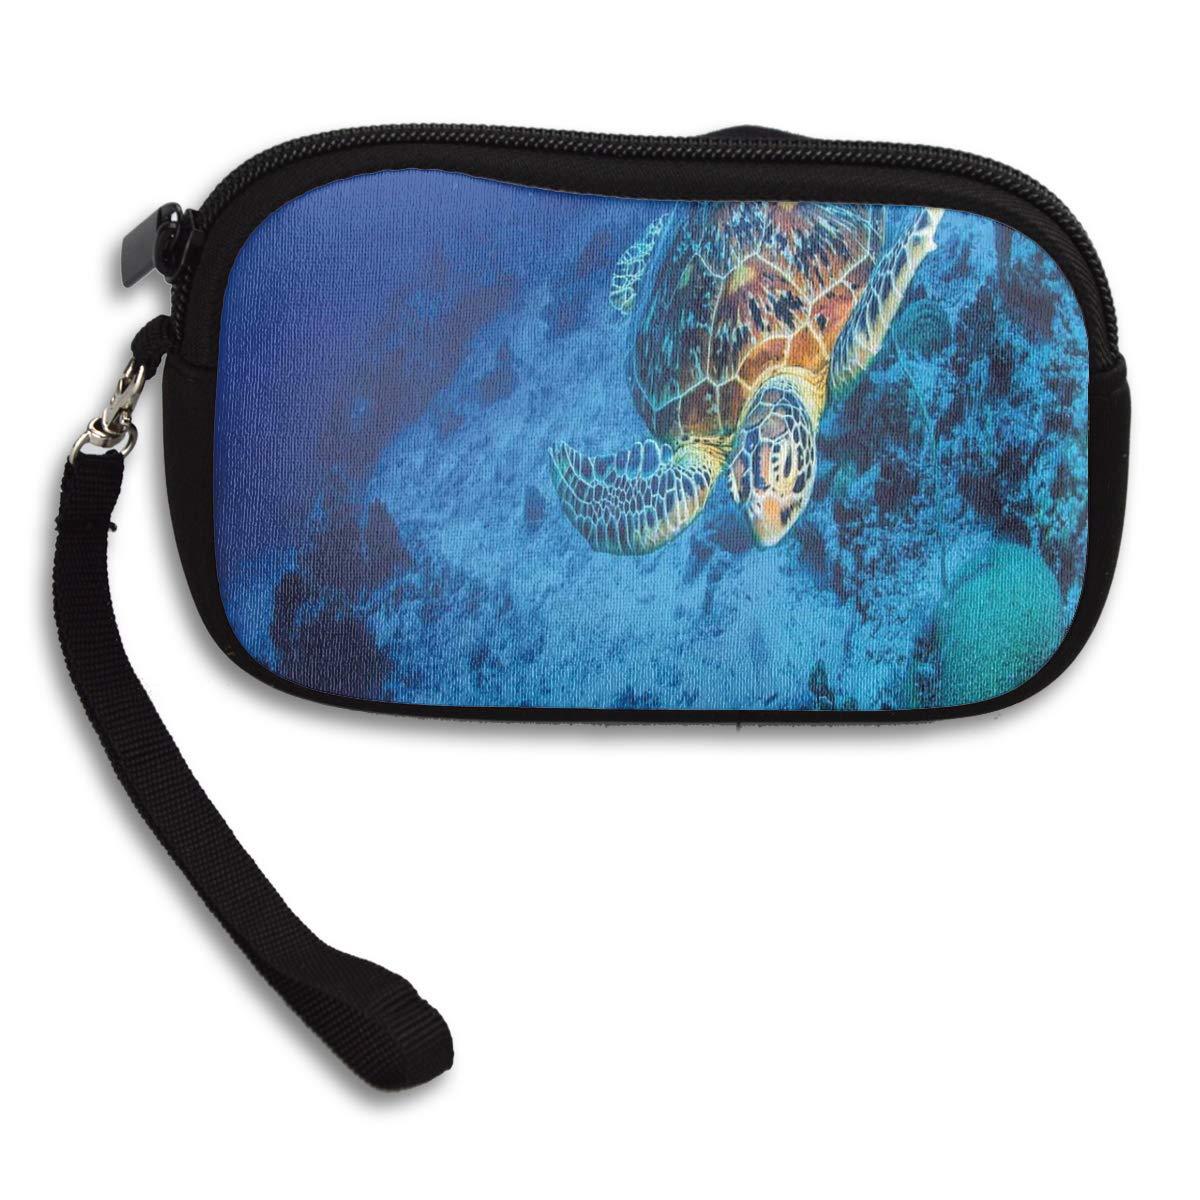 Sea Turtle In Deep Blue Waters Coin Pouch Clutch Purse Wristlet Wallet Phone Card Holder Handbag